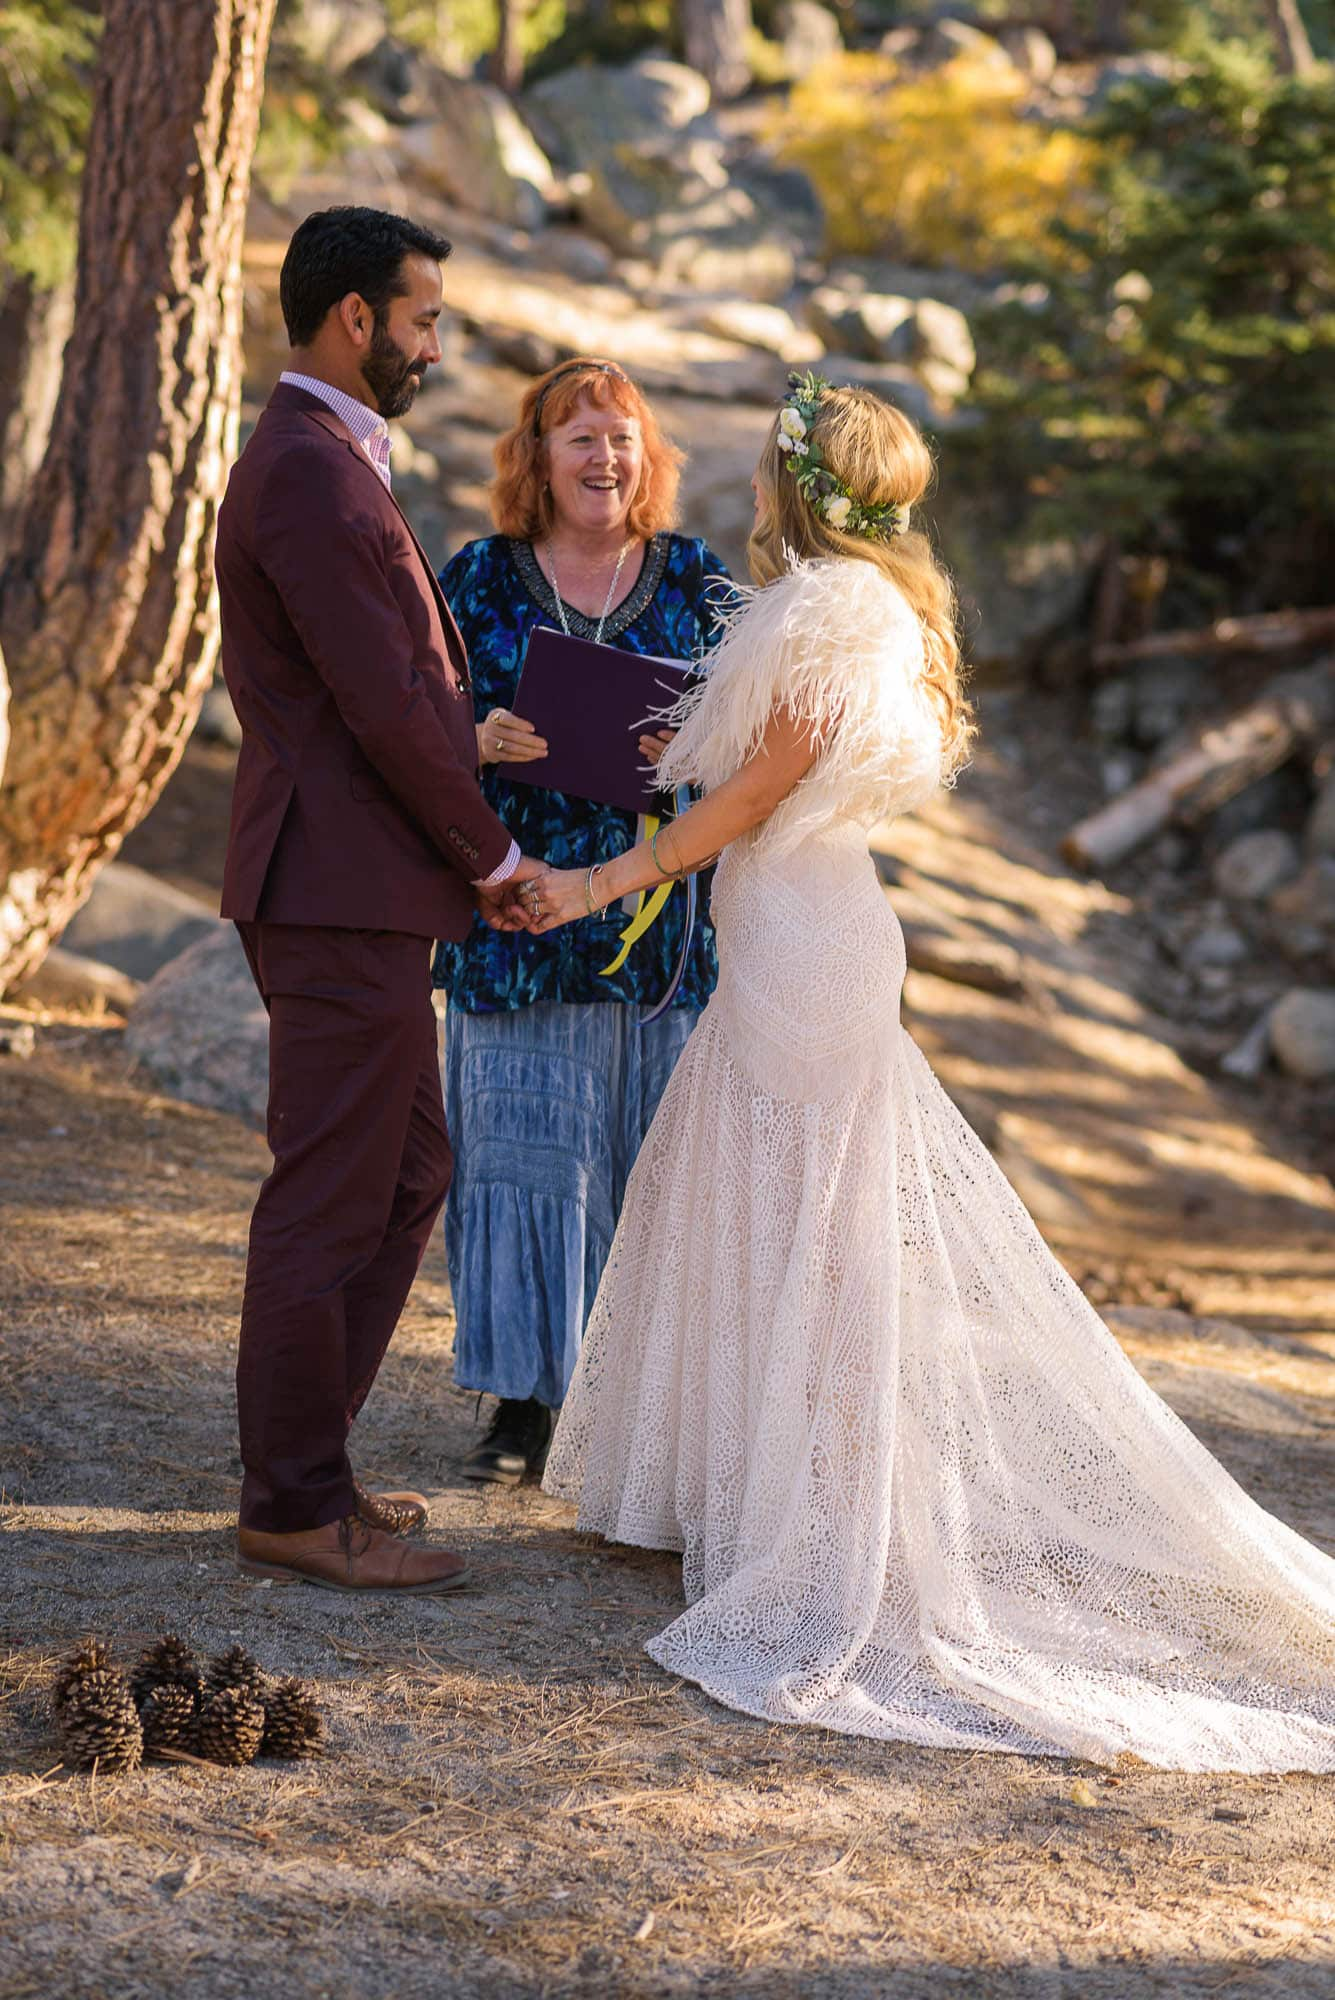 015_Alan_and_Heidi_Wedding_Natalie_Mike